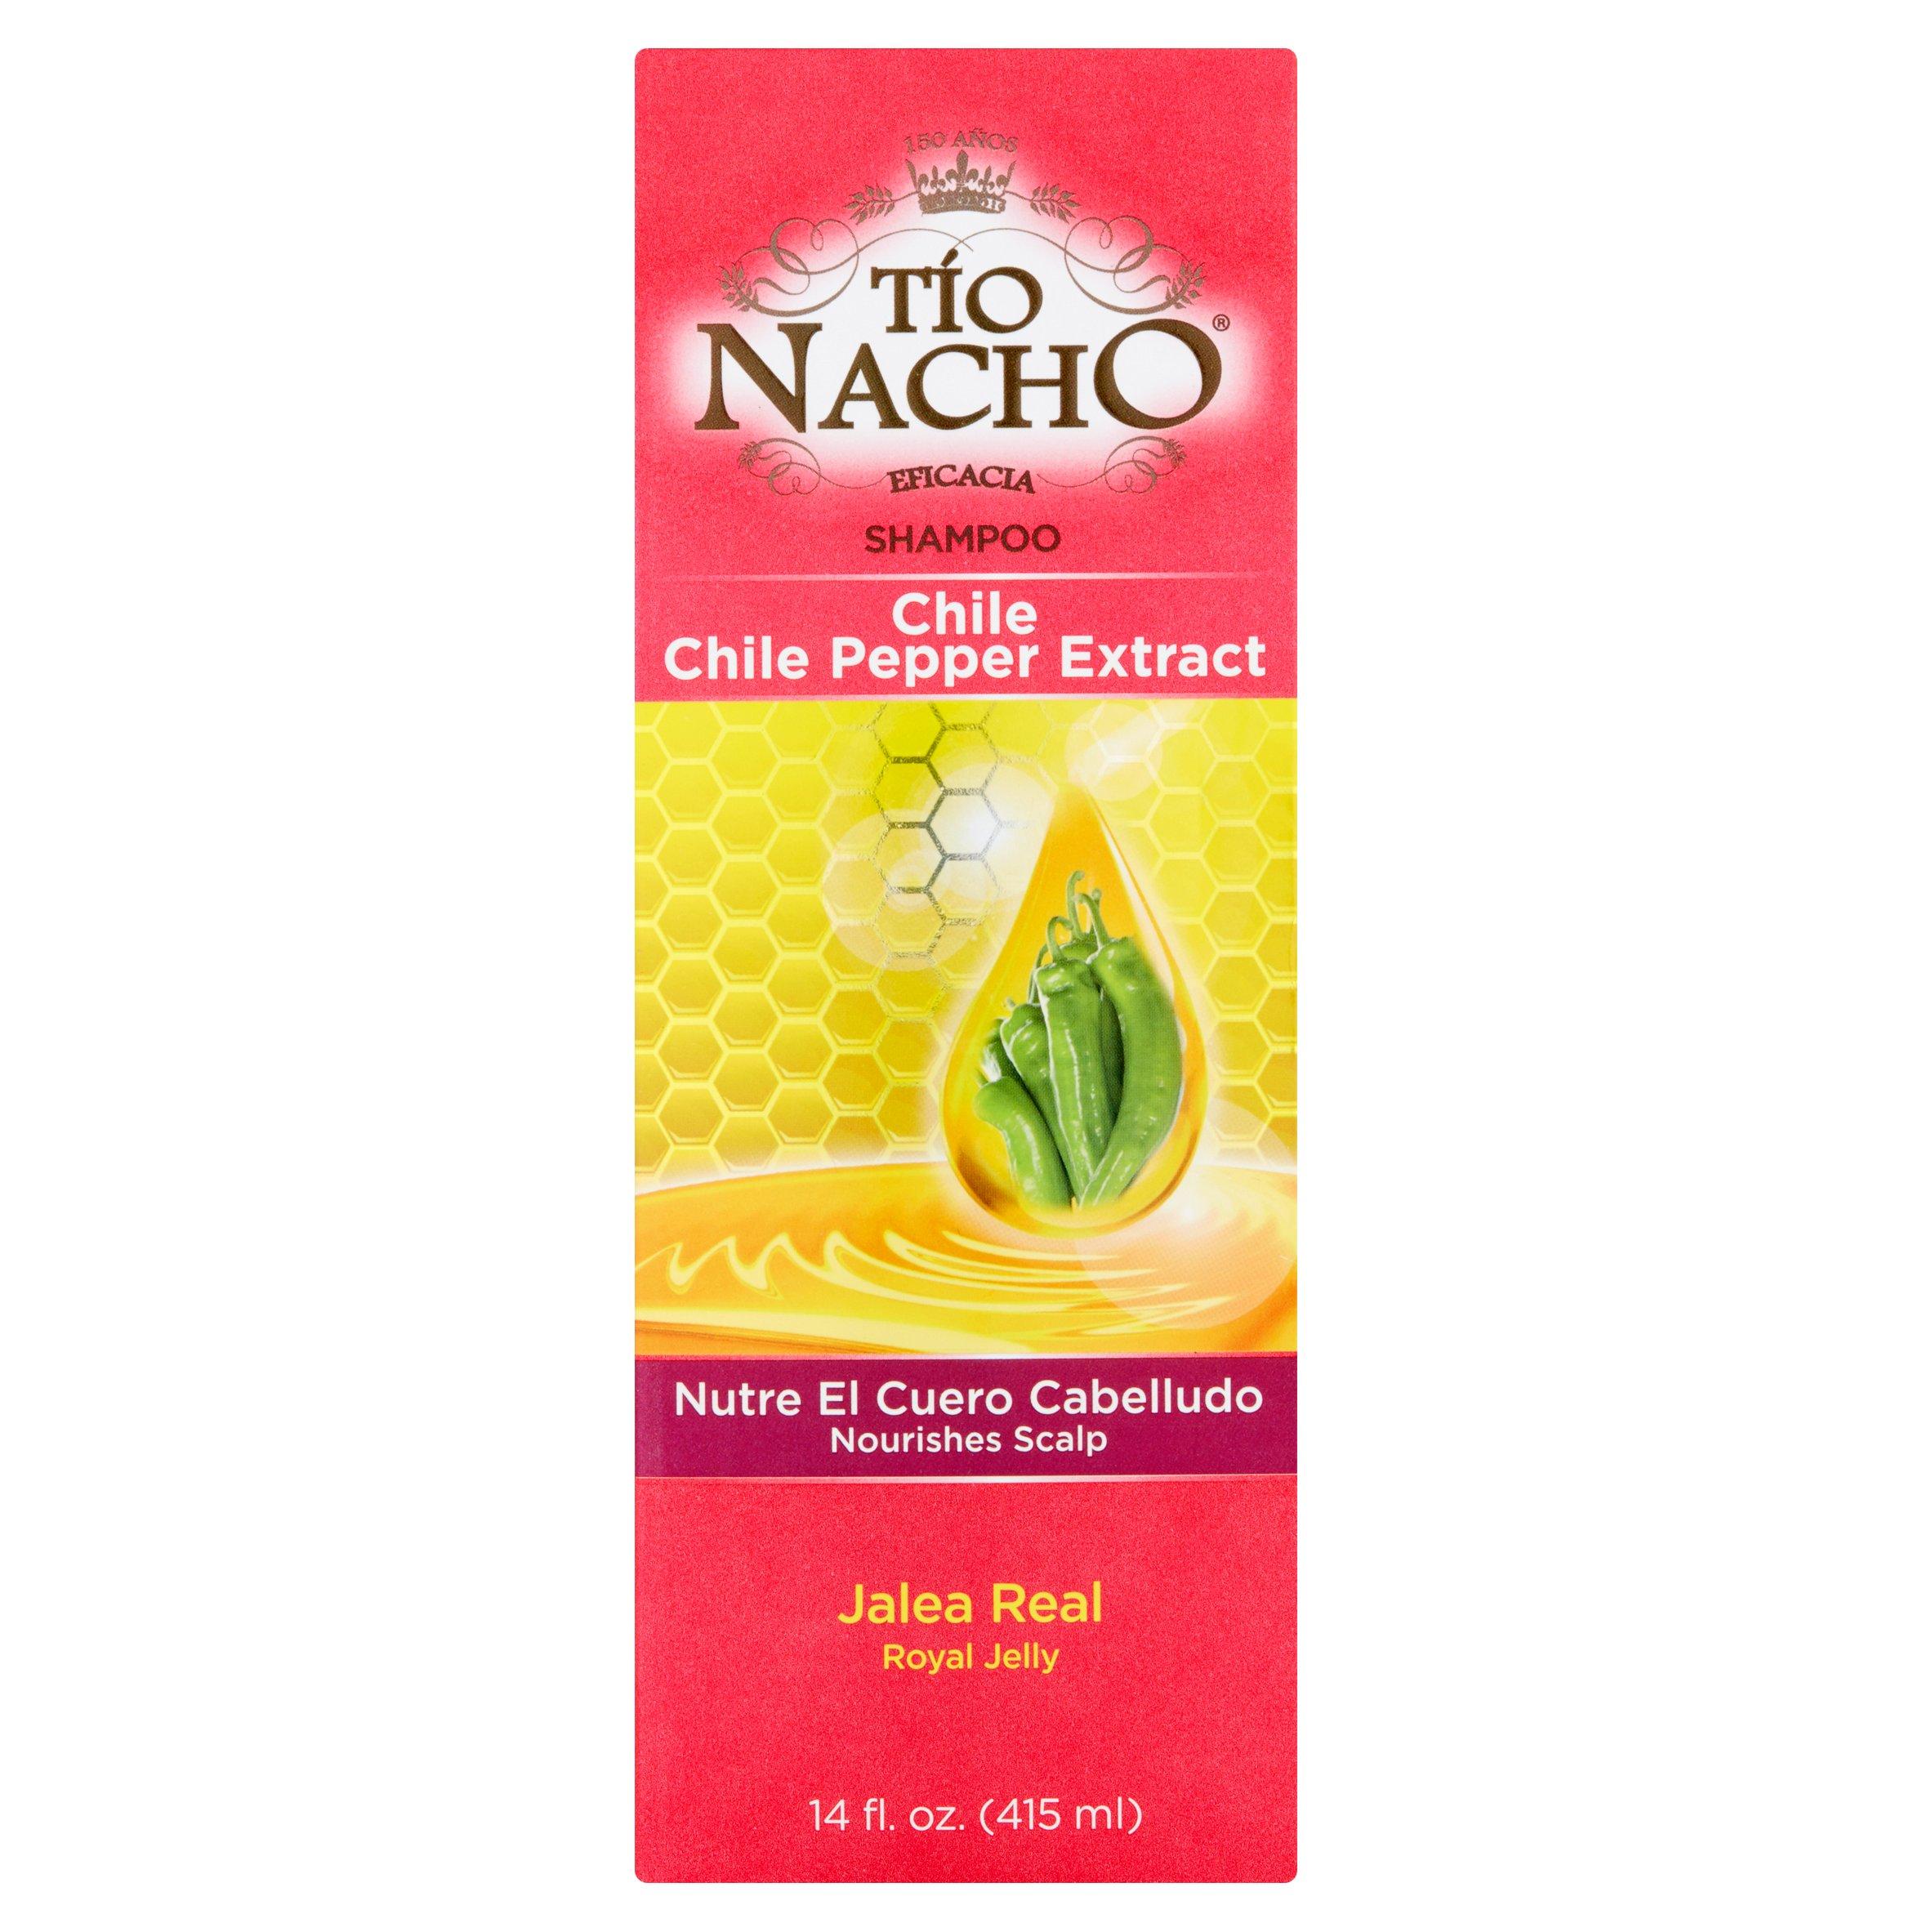 Tio Nacho Chile Shampoo 14 oz.